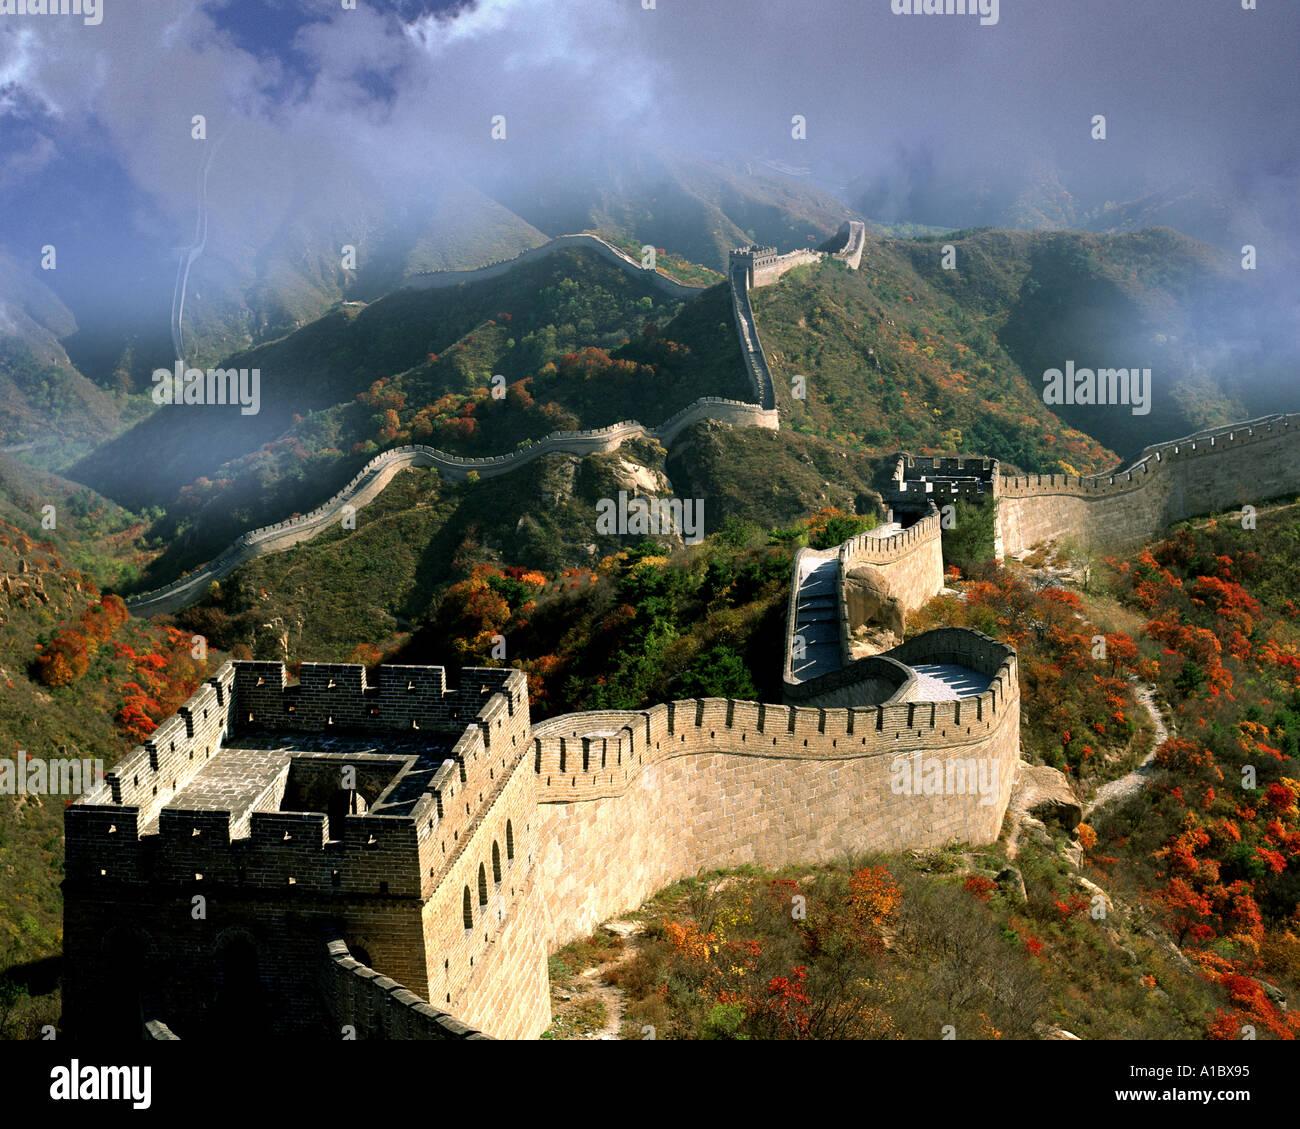 CN - NORTE DE CHINA: La Gran Muralla Imagen De Stock